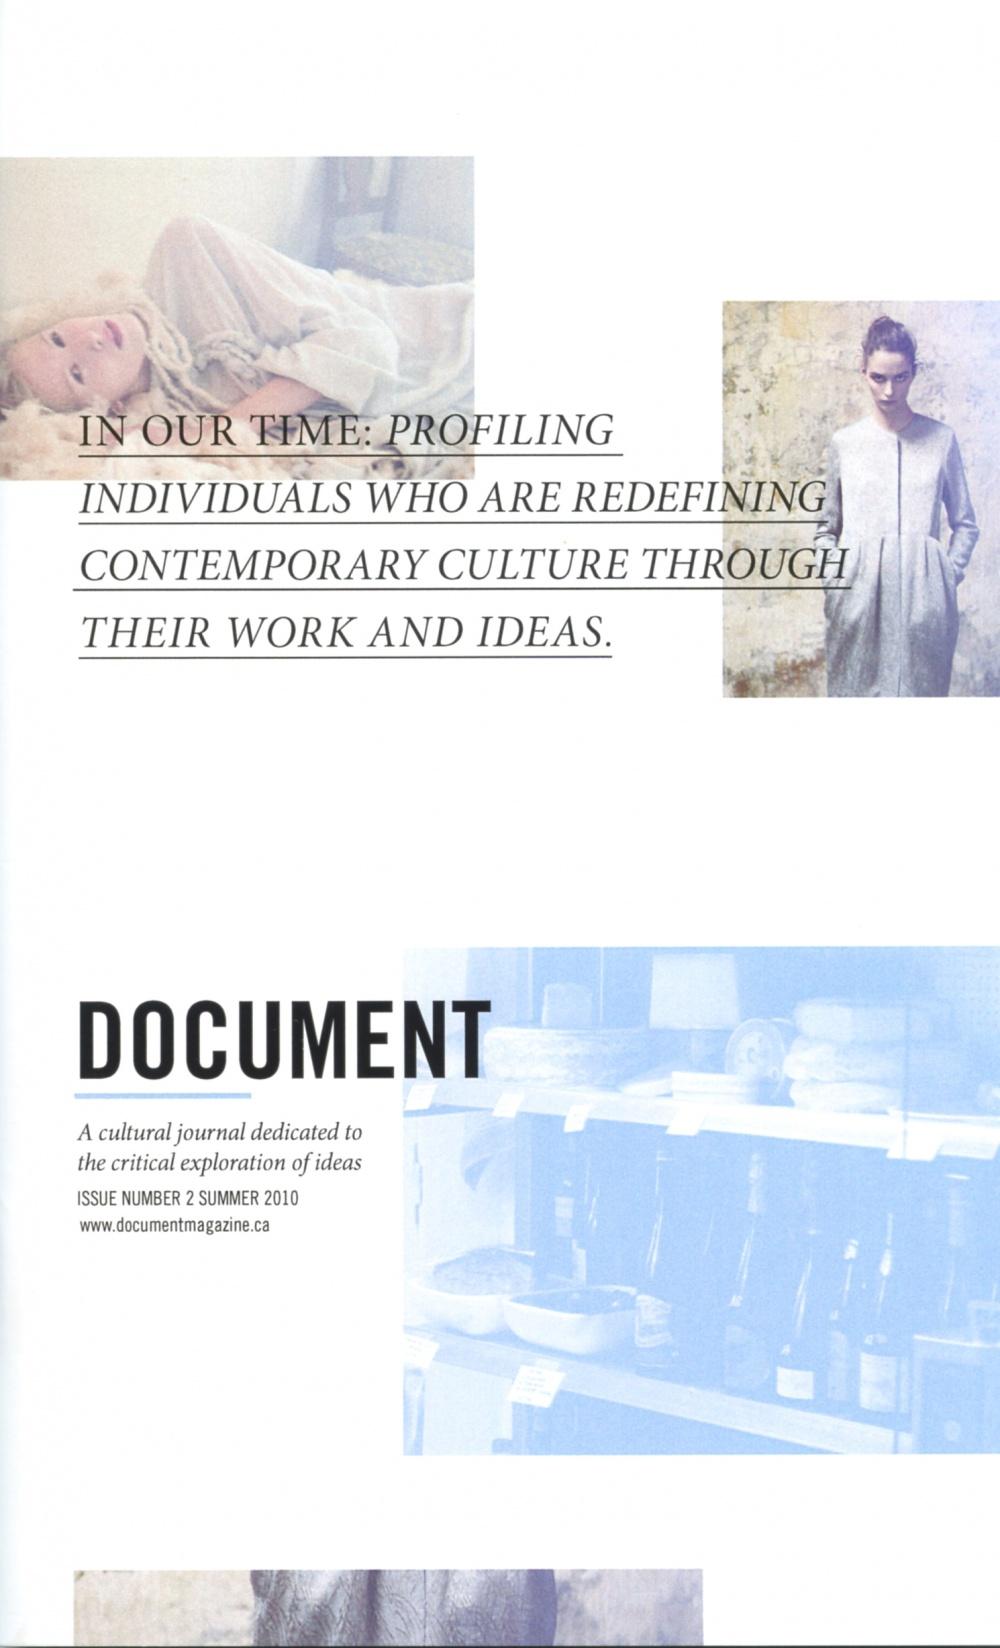 Document, Issue #2, Summer 2010